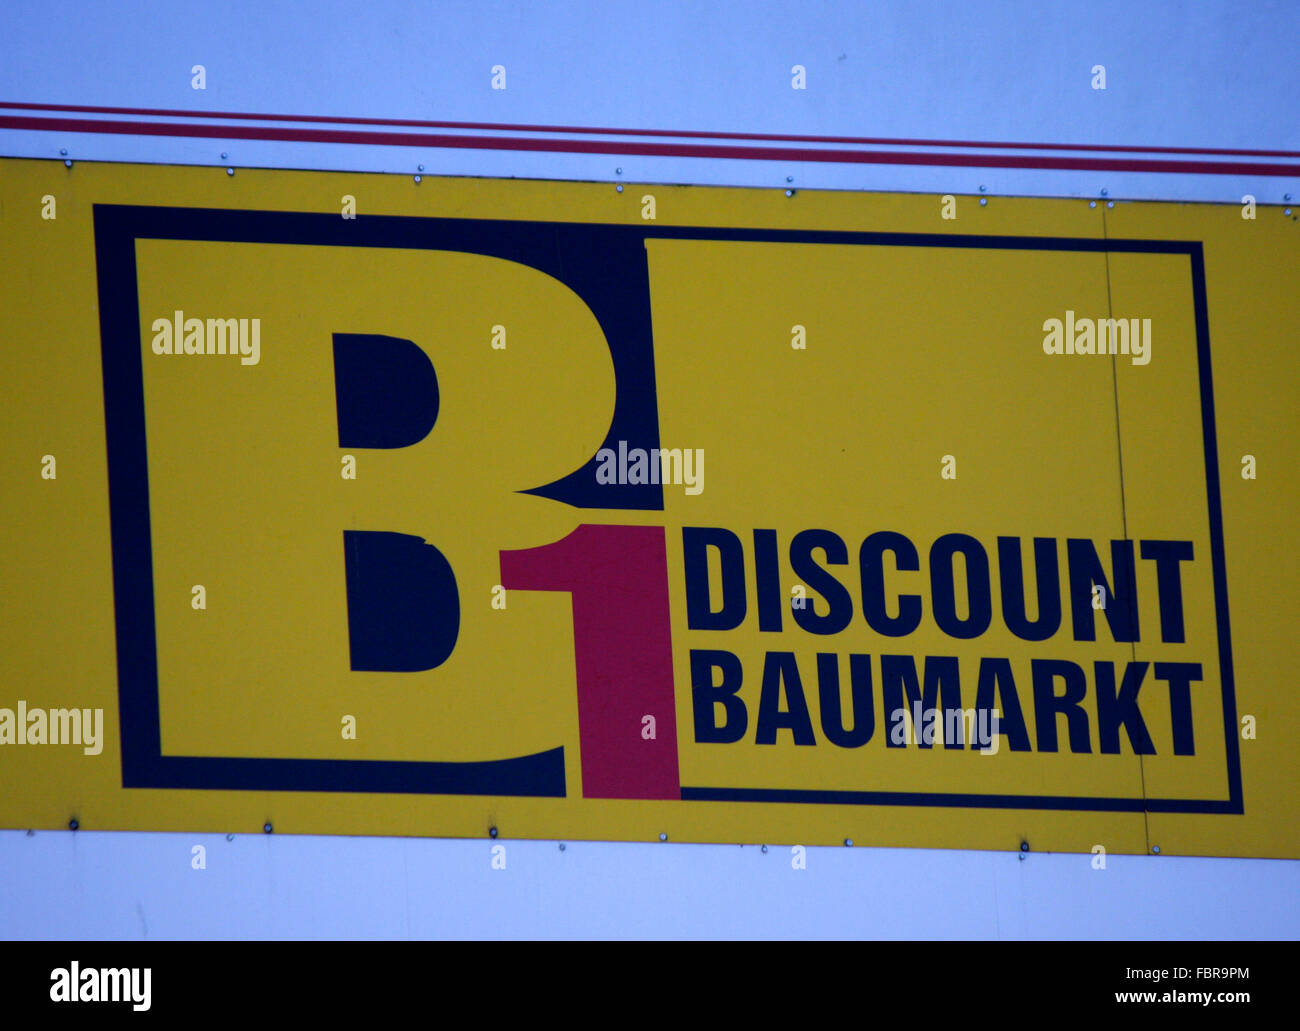 b1 baumarkt bielefeld trendy hauptbild with b1 baumarkt bielefeld free b1 baumarkt bielefeld. Black Bedroom Furniture Sets. Home Design Ideas